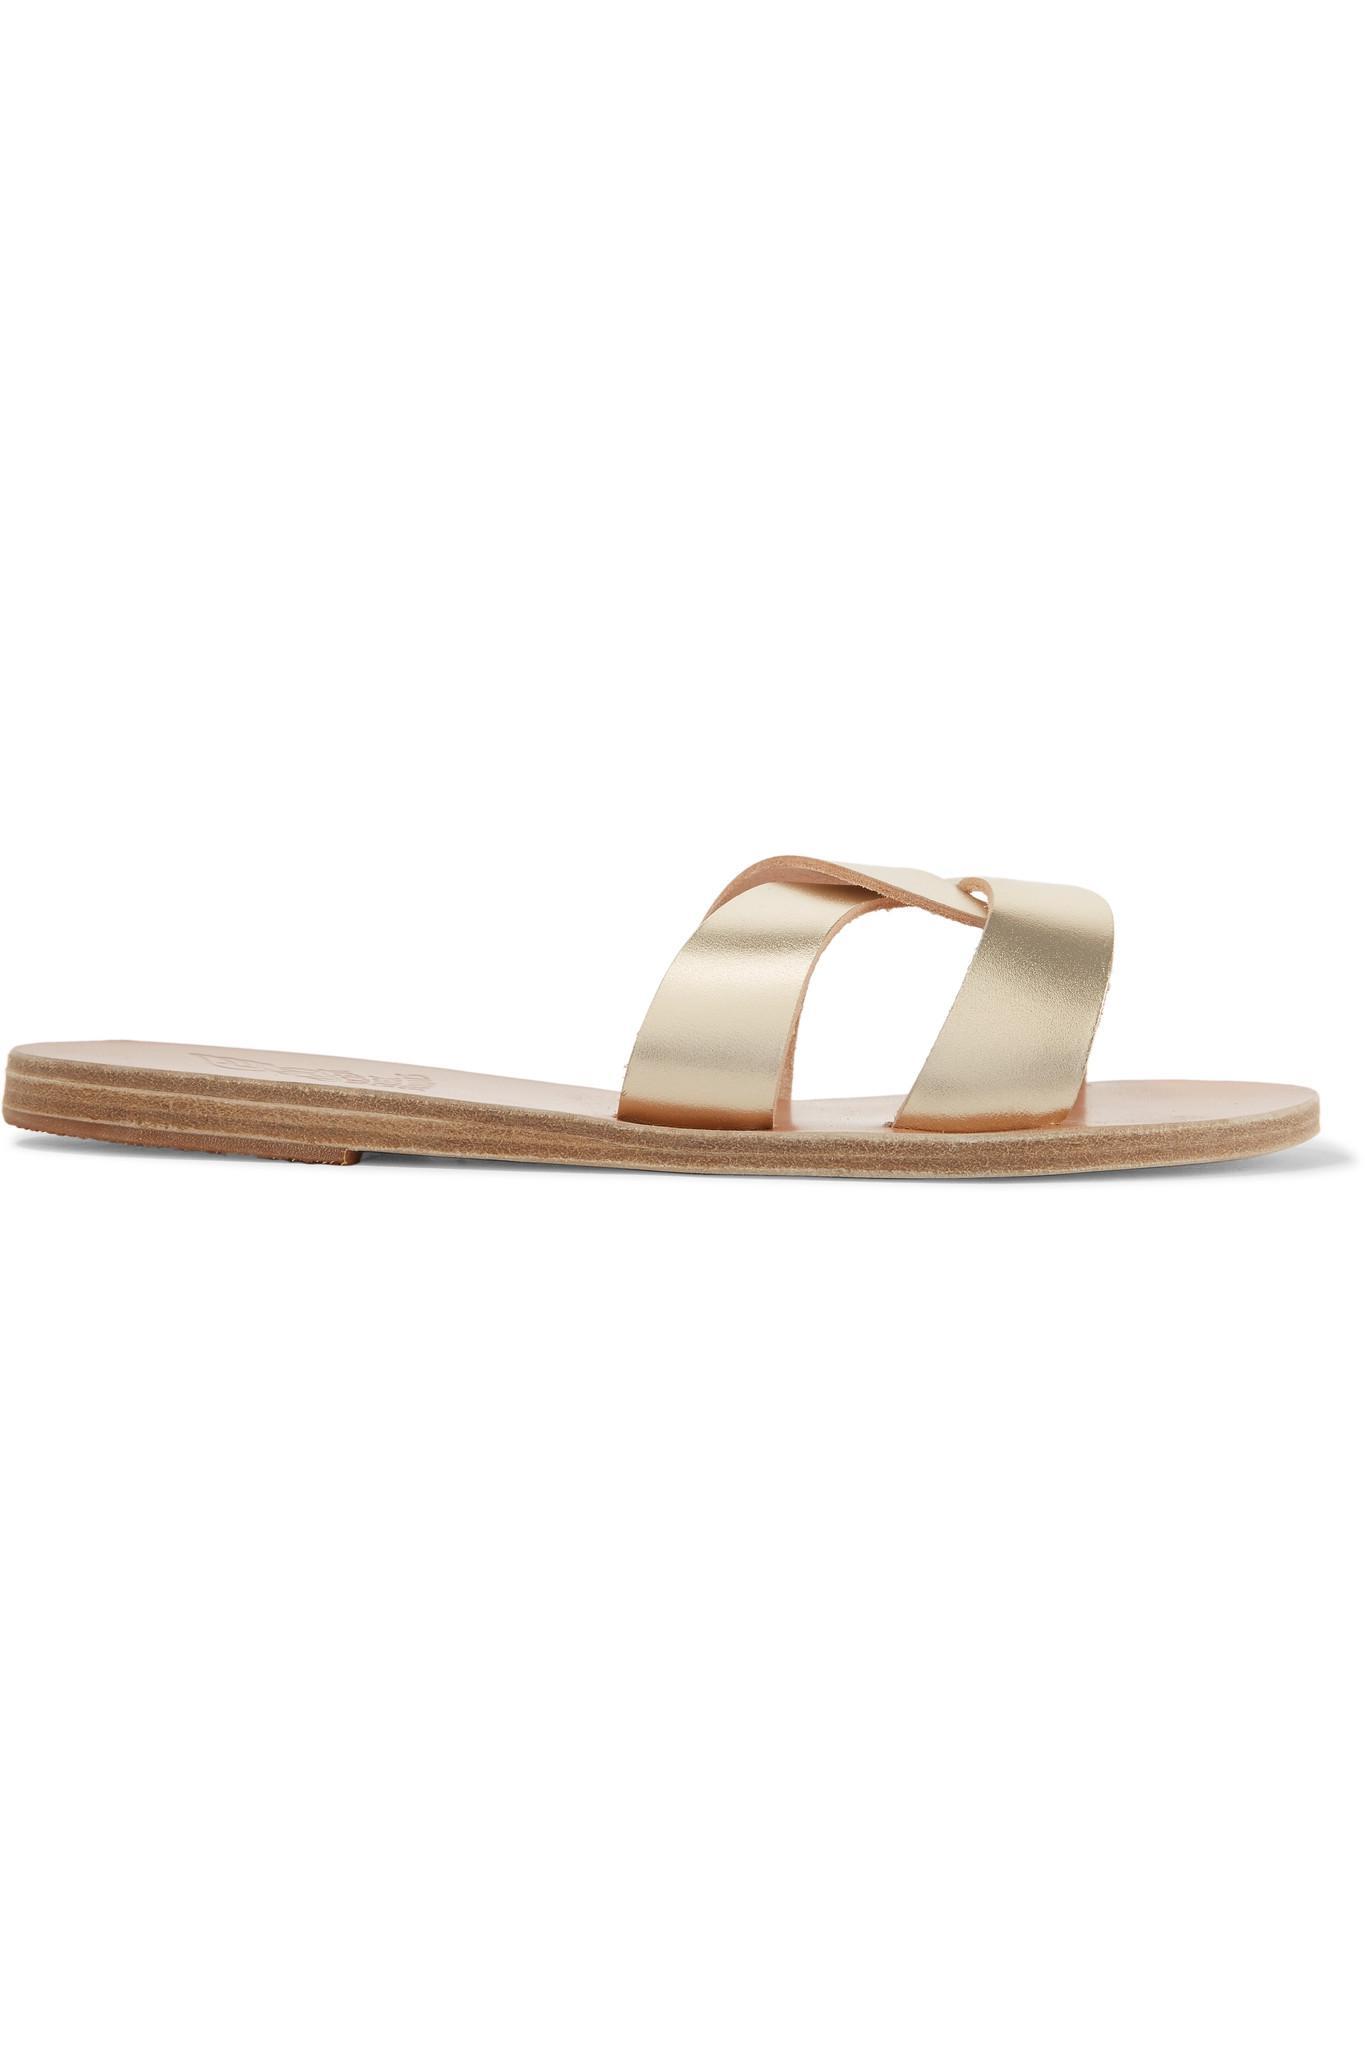 65f89edca91614 Claquettes En Cuir Métallisé à Découpes Desmos Ancient Greek Sandals ...